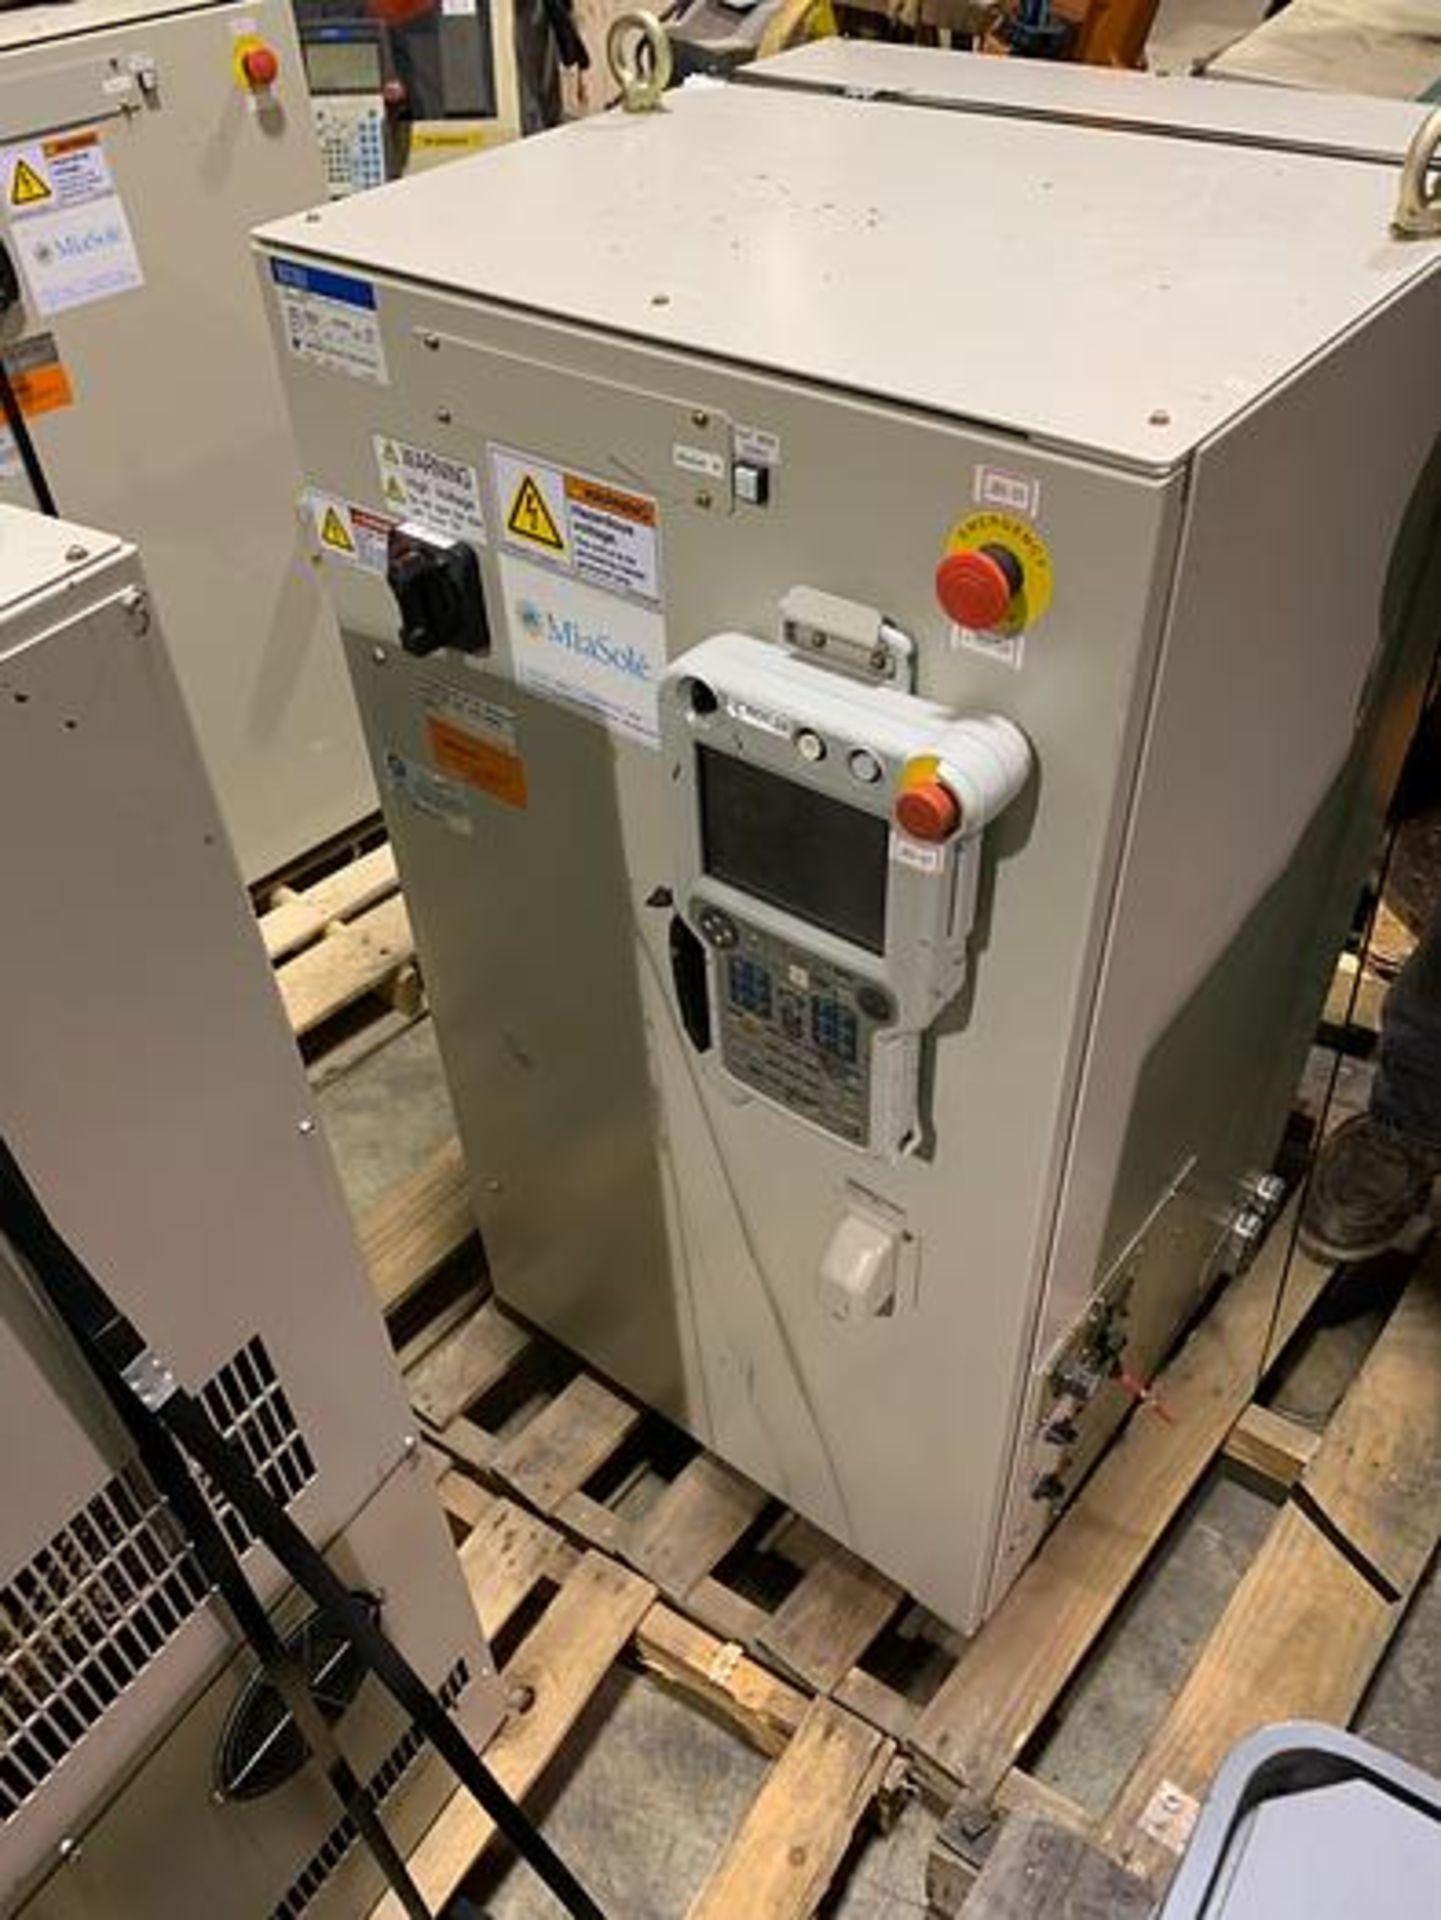 Lot 60 - MOTOMAN SSF2000 6 KG X 1,378mm REACH 6 AXIS CNC ROBOT WITH NX100 CONTROL, YEAR 2008, SN S86AO7-1-3